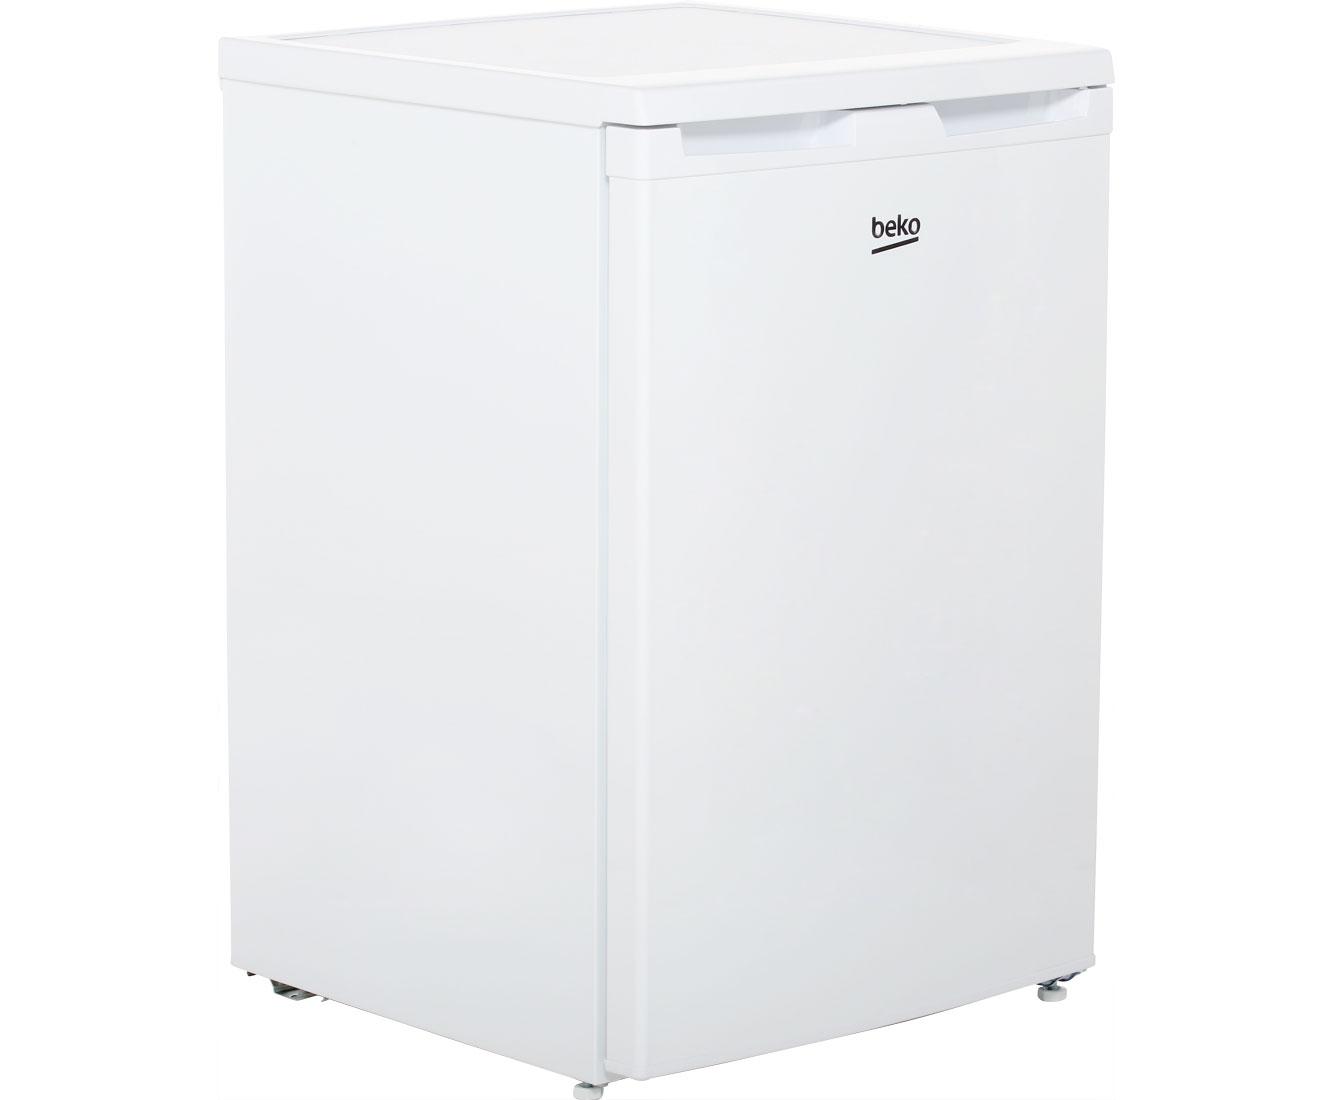 Beko TSE1282 Kühlschränke - Weiß